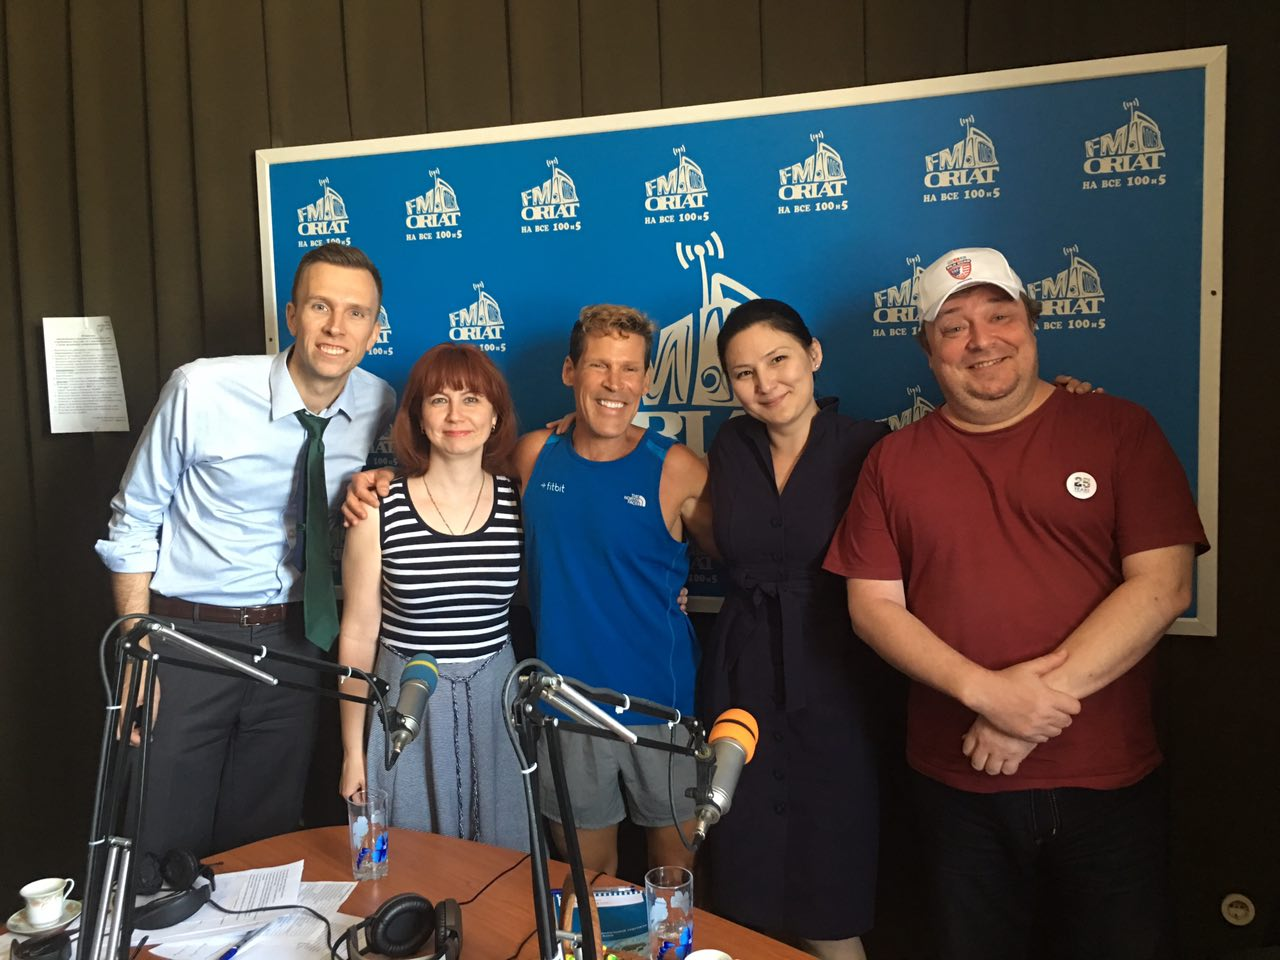 Dean Karnazes smiling with the radio crew